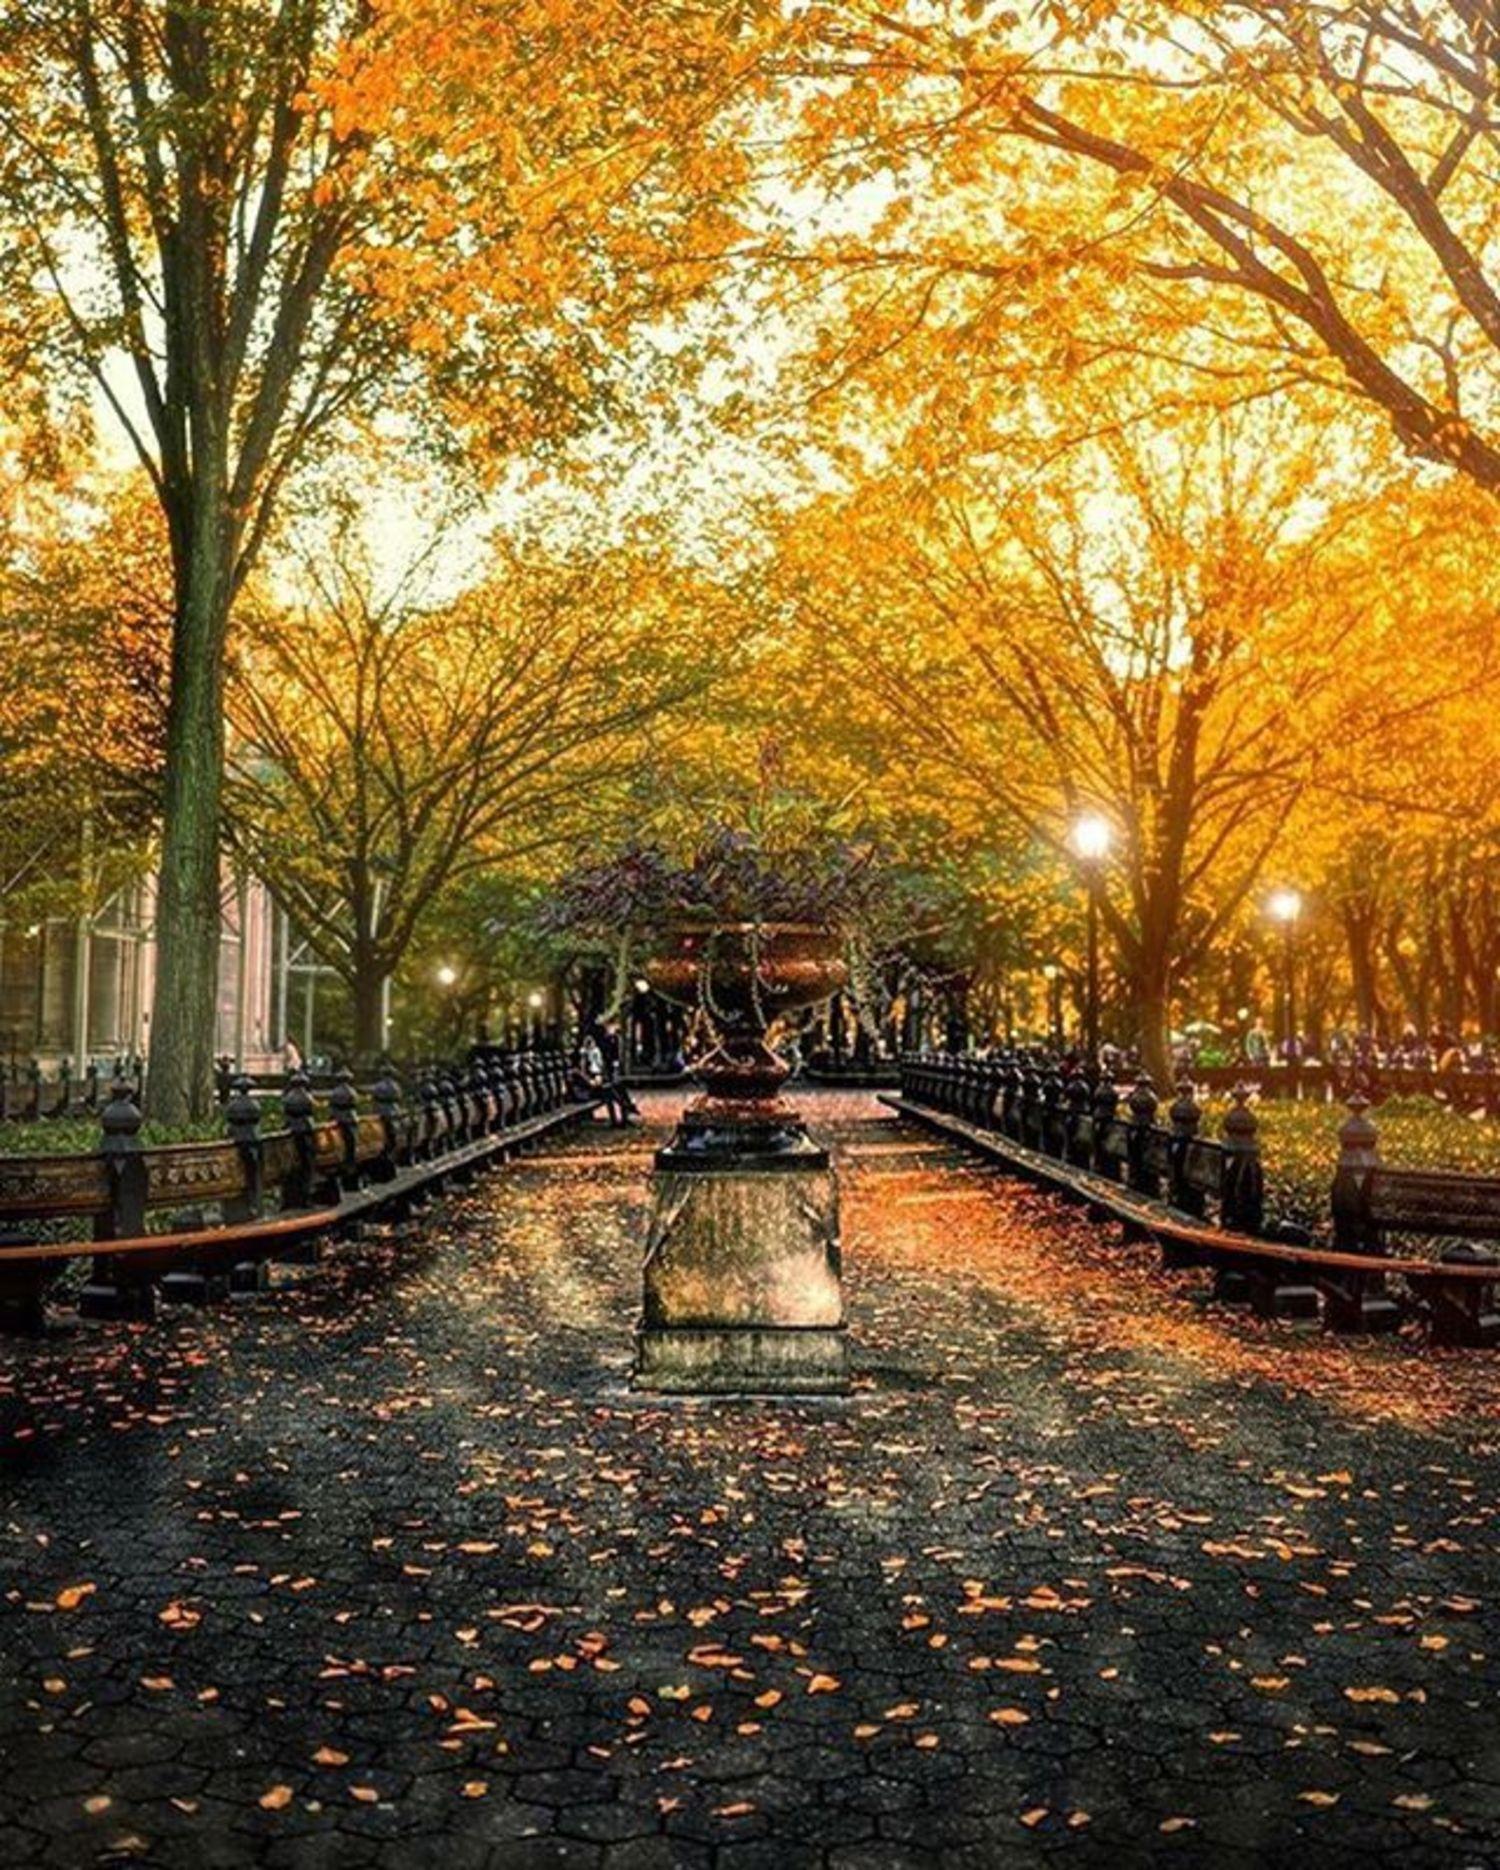 New York, New York. Photo via @gina_brake_photography_nyc #viewingnyc #newyorkcity #newyork #nyc